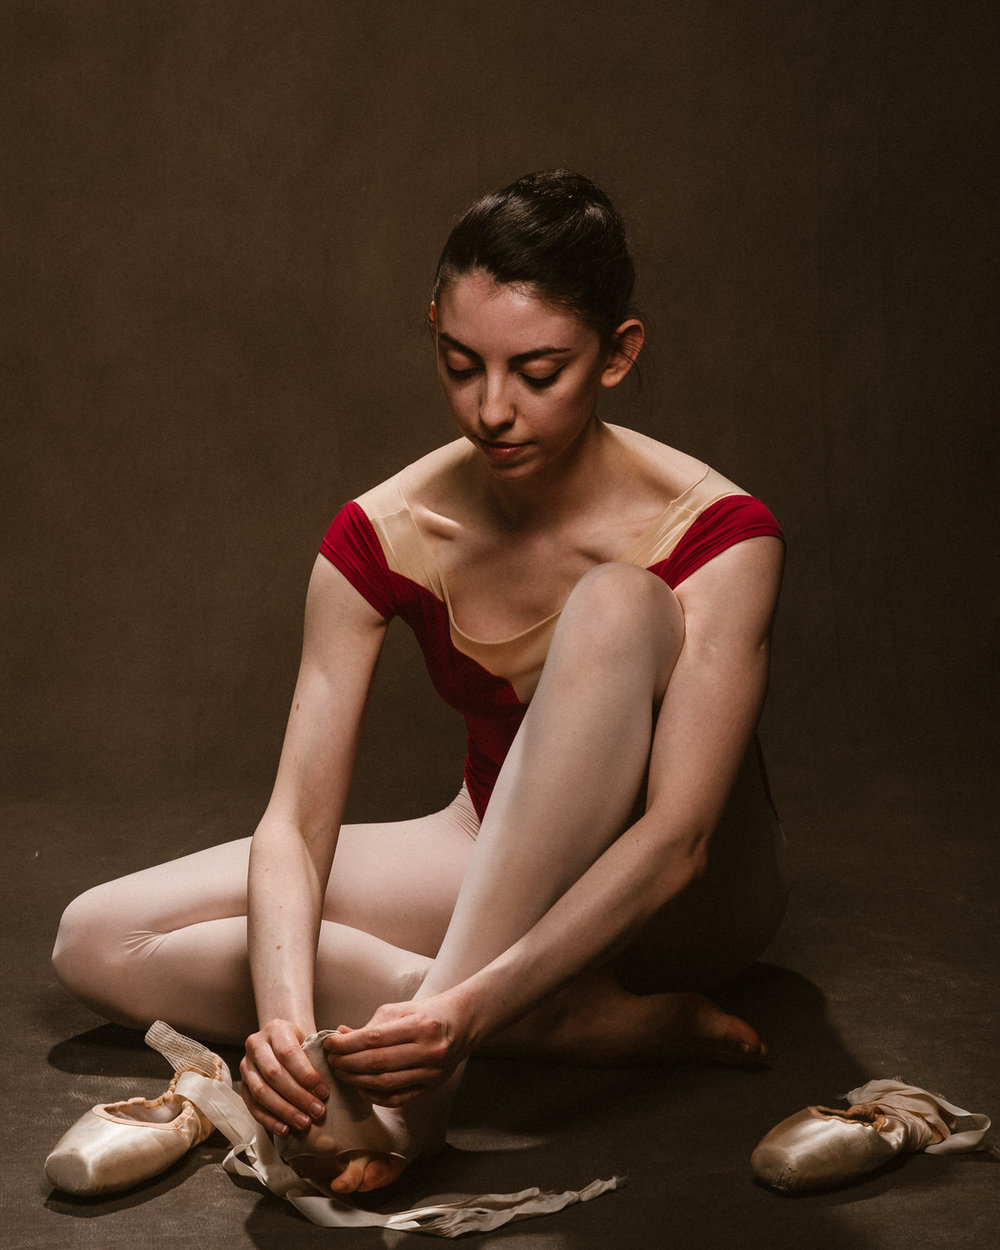 Sarah_Nolan_Ballet_035.jpg